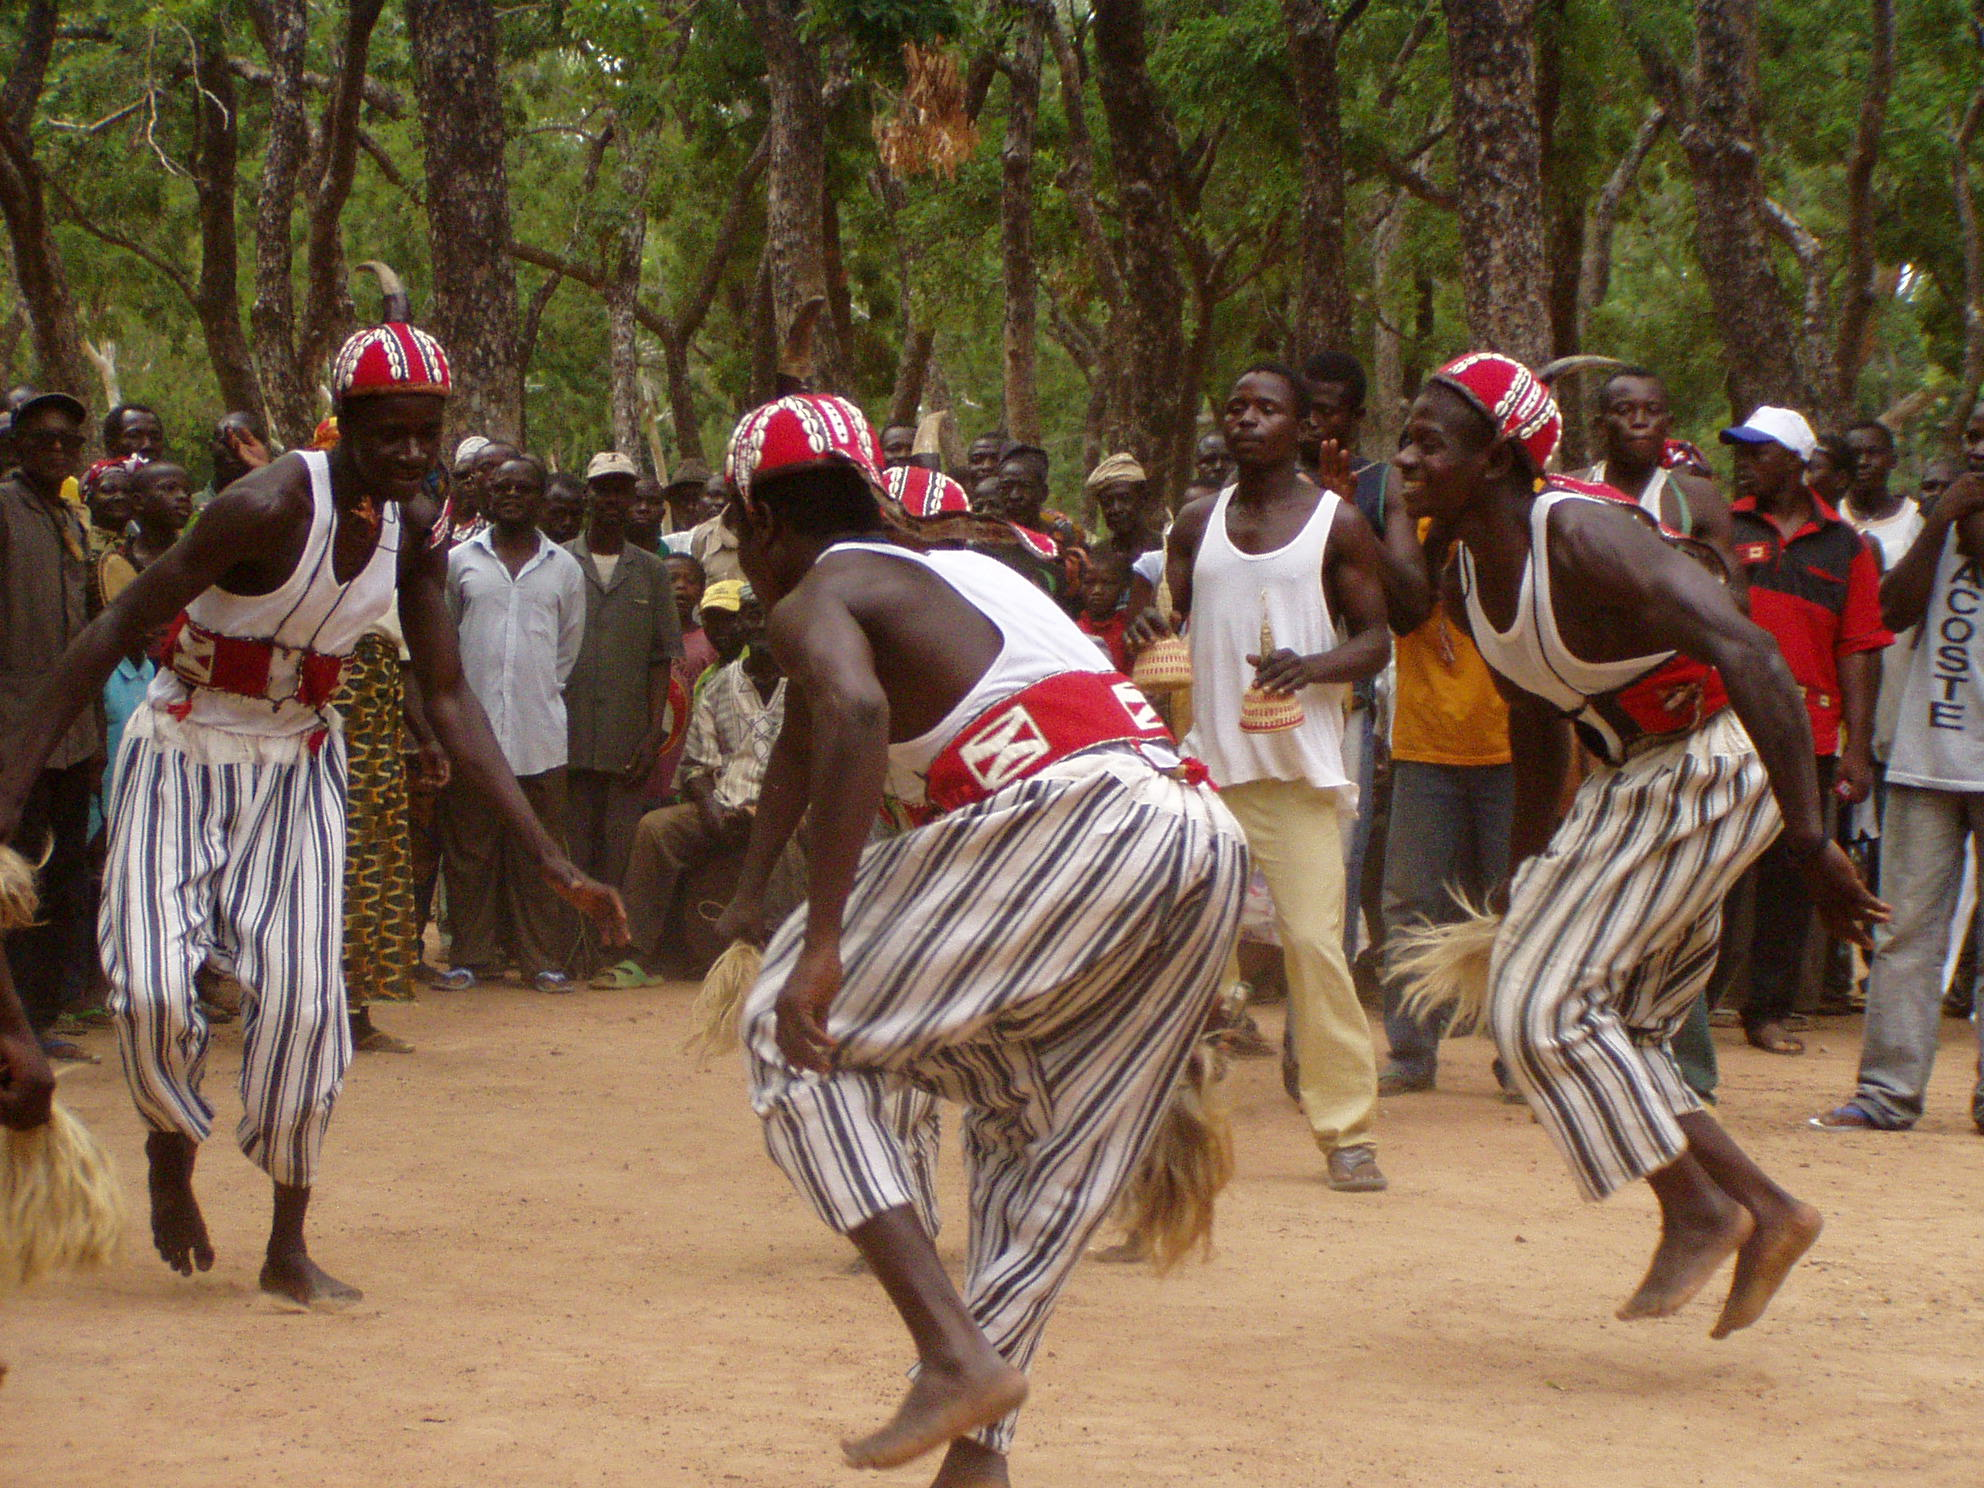 Danseurs kassena en pleine action. Kassena dancers in action.